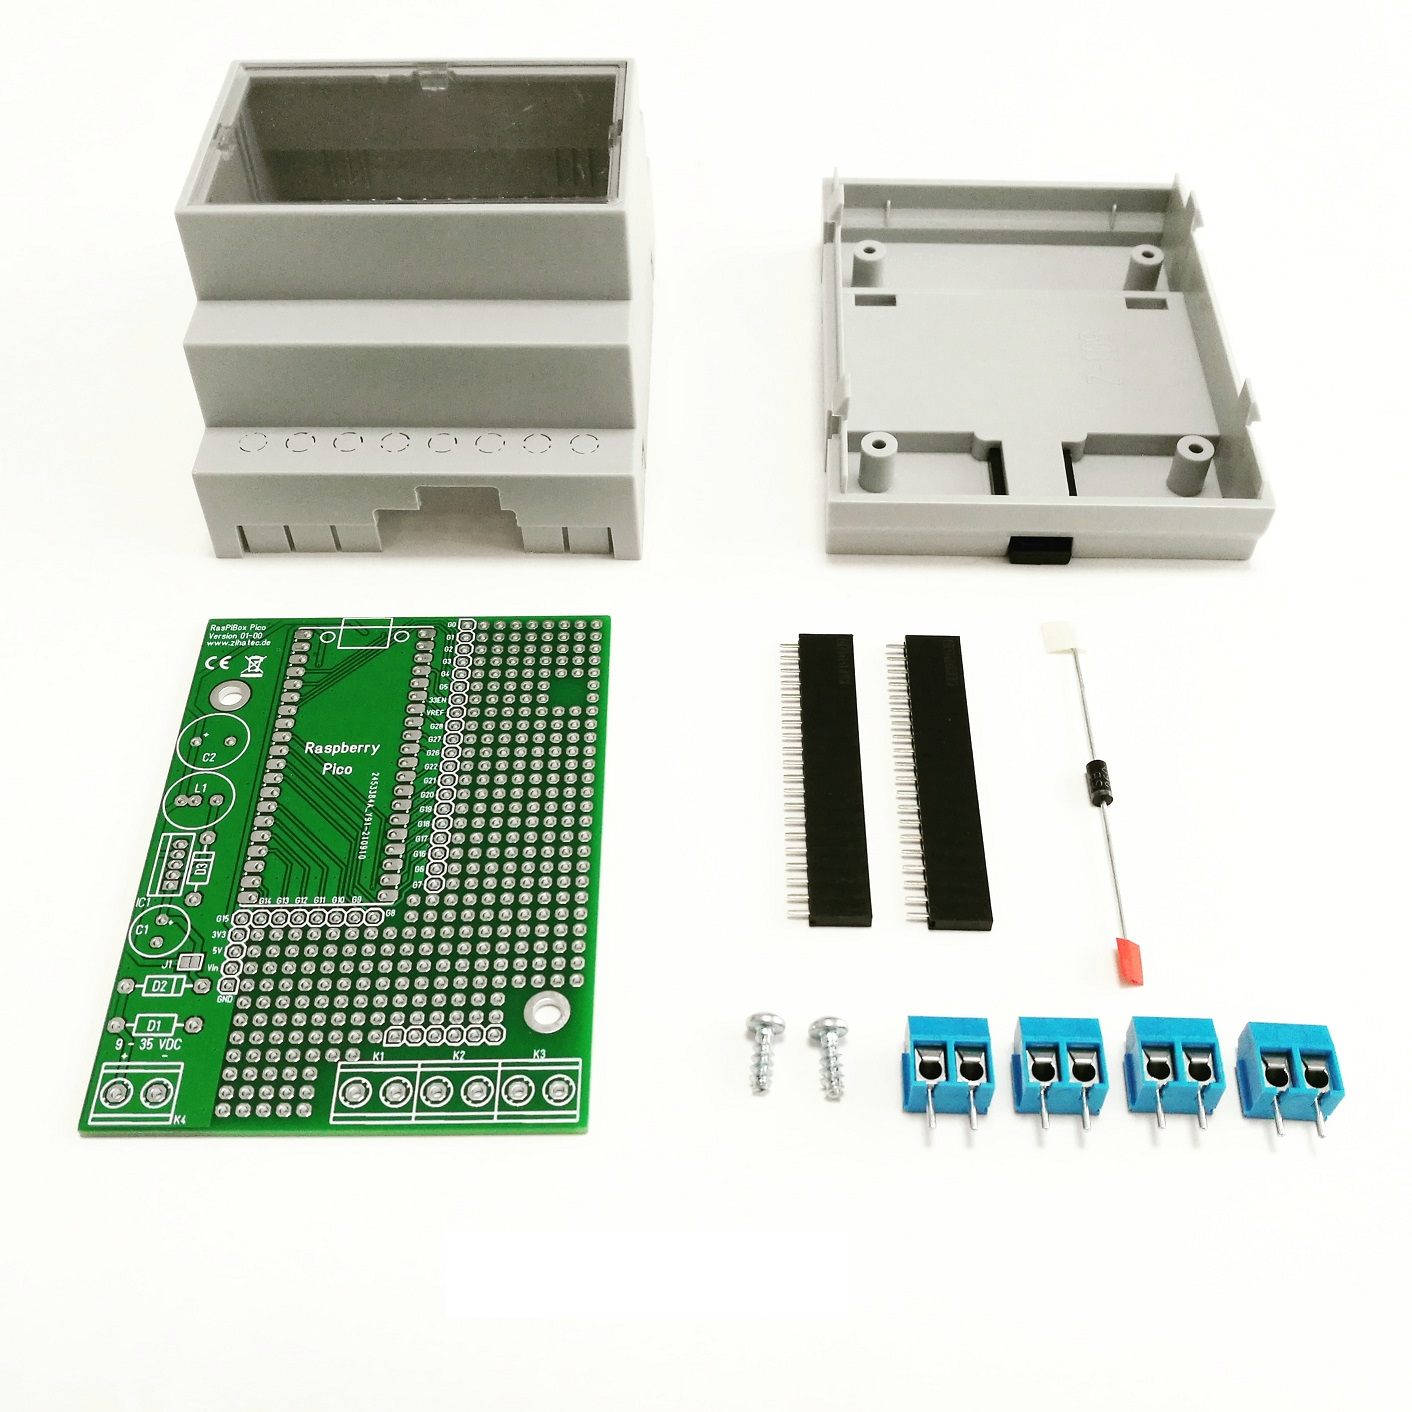 Basic kit (without voltage regulator)